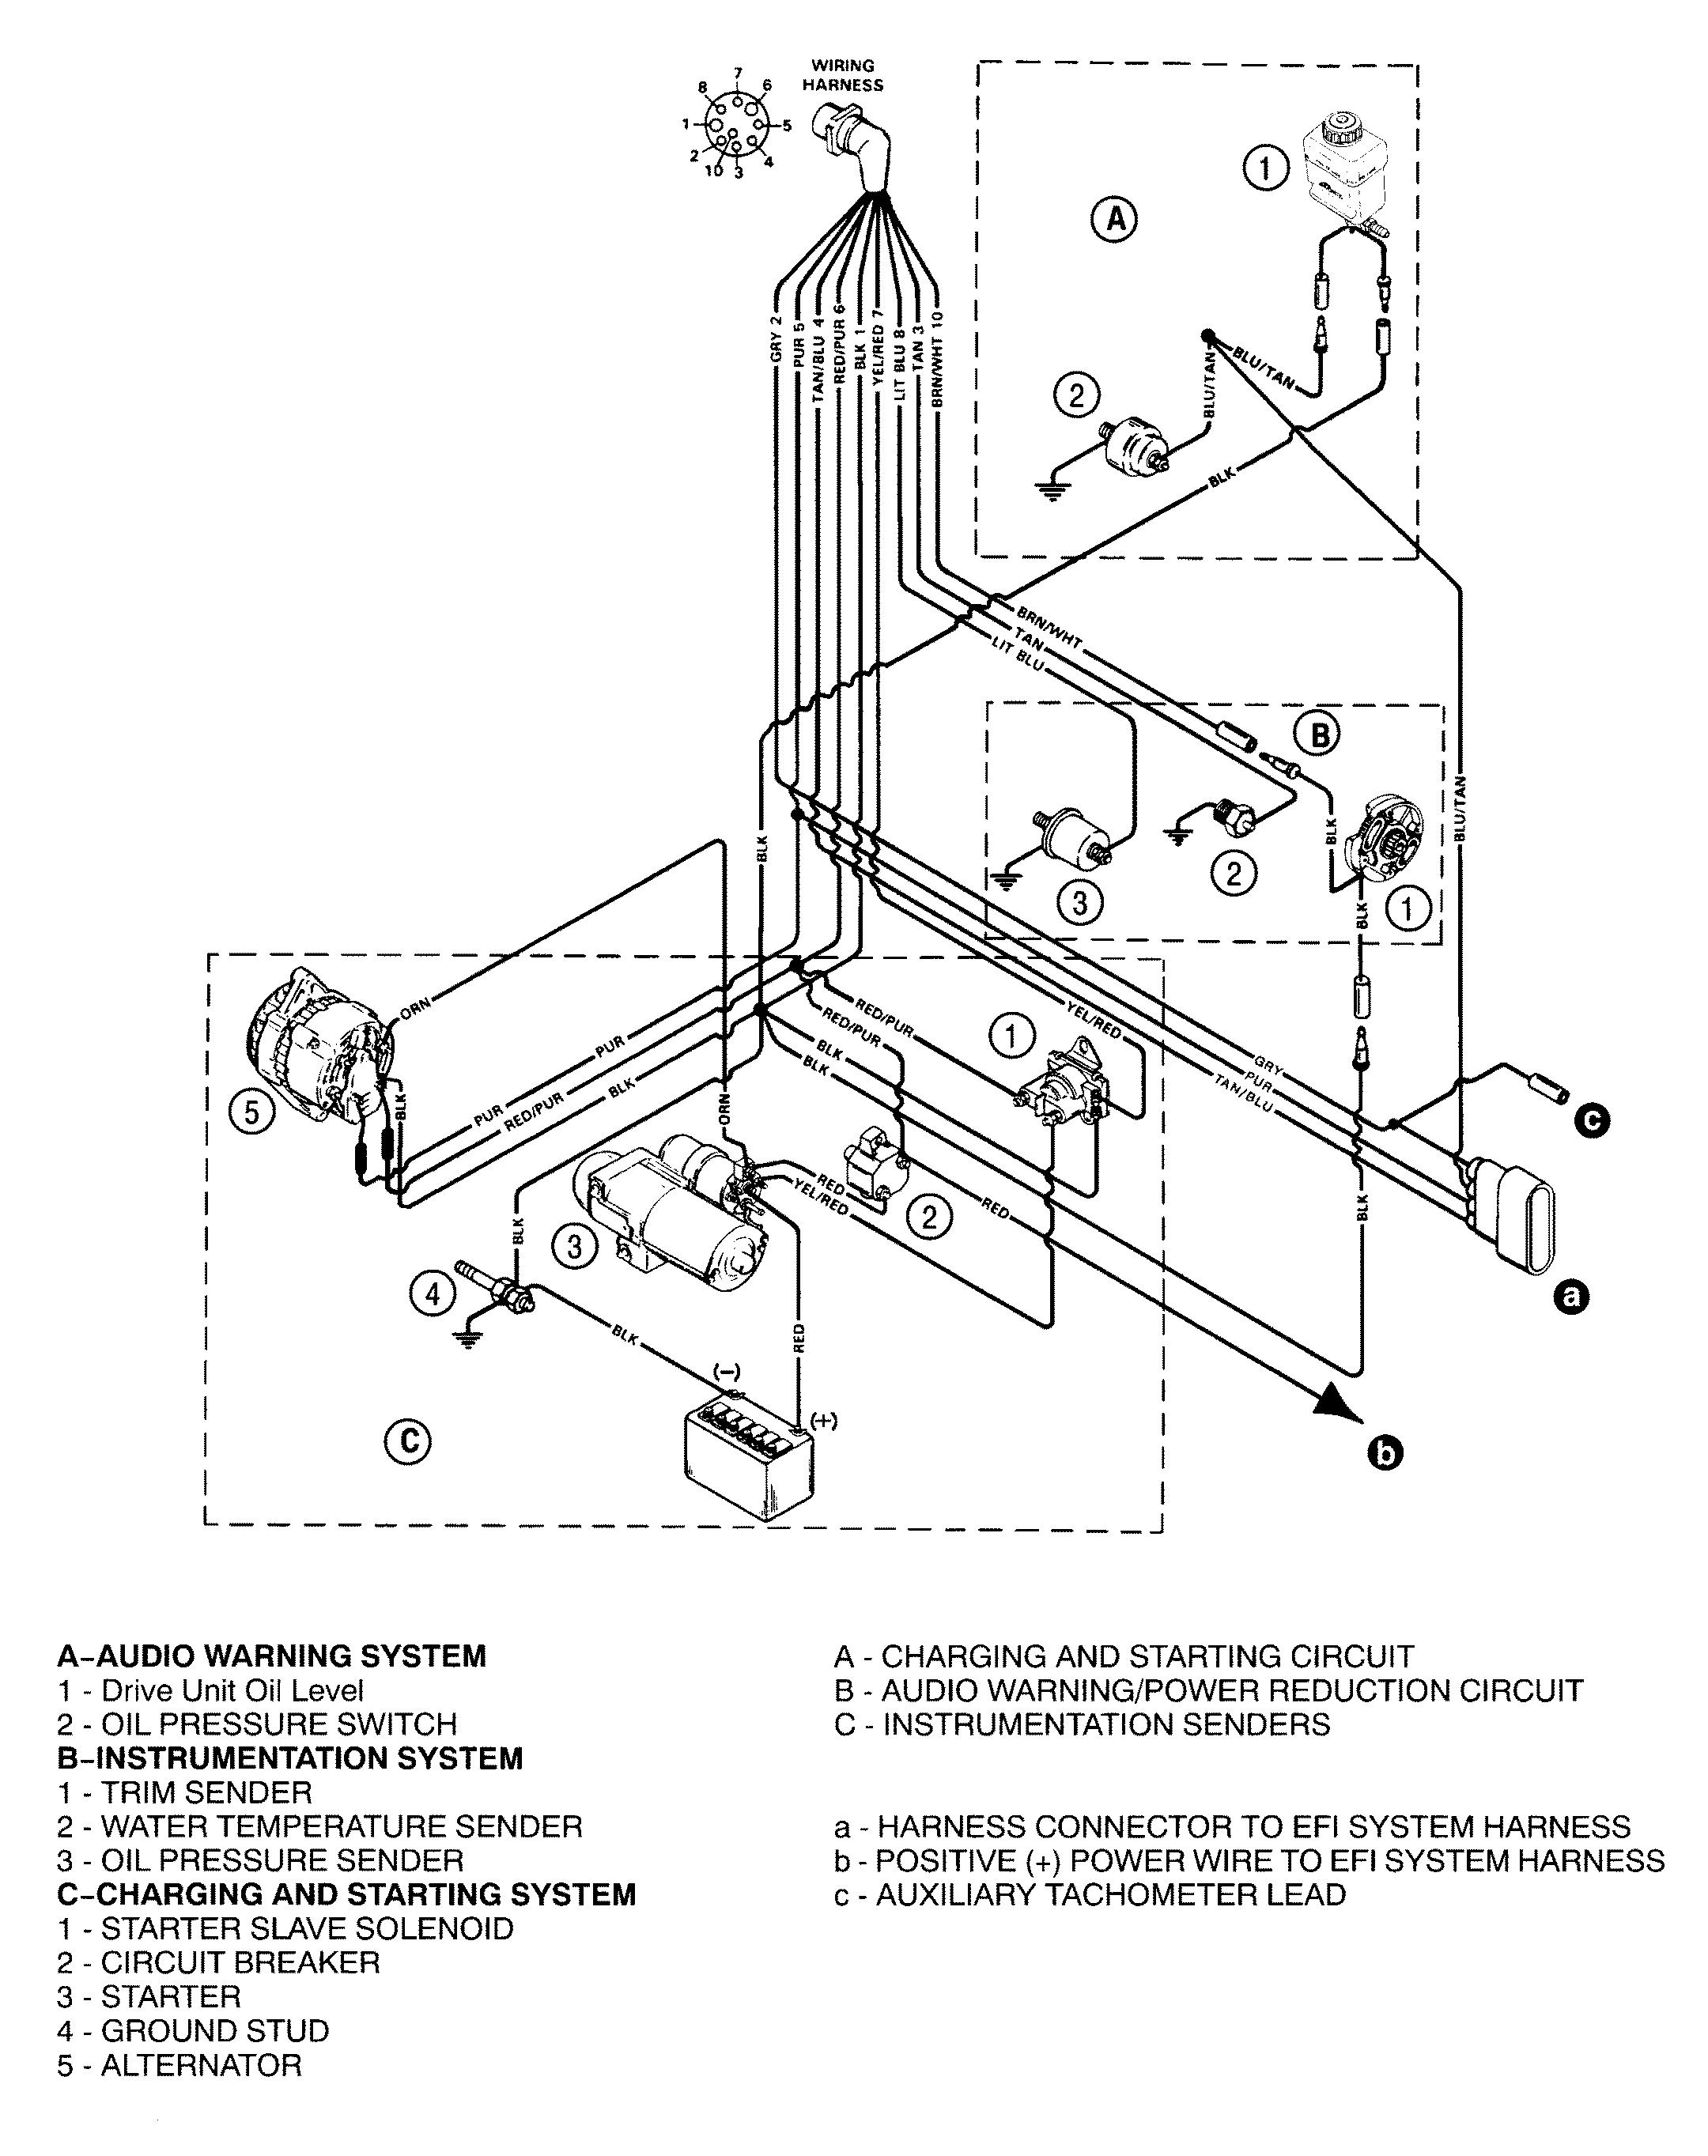 5?resize=665%2C840&ssl=1 4 3 mercruiser starter wiring diagram 4 wiring diagrams collection  at gsmx.co